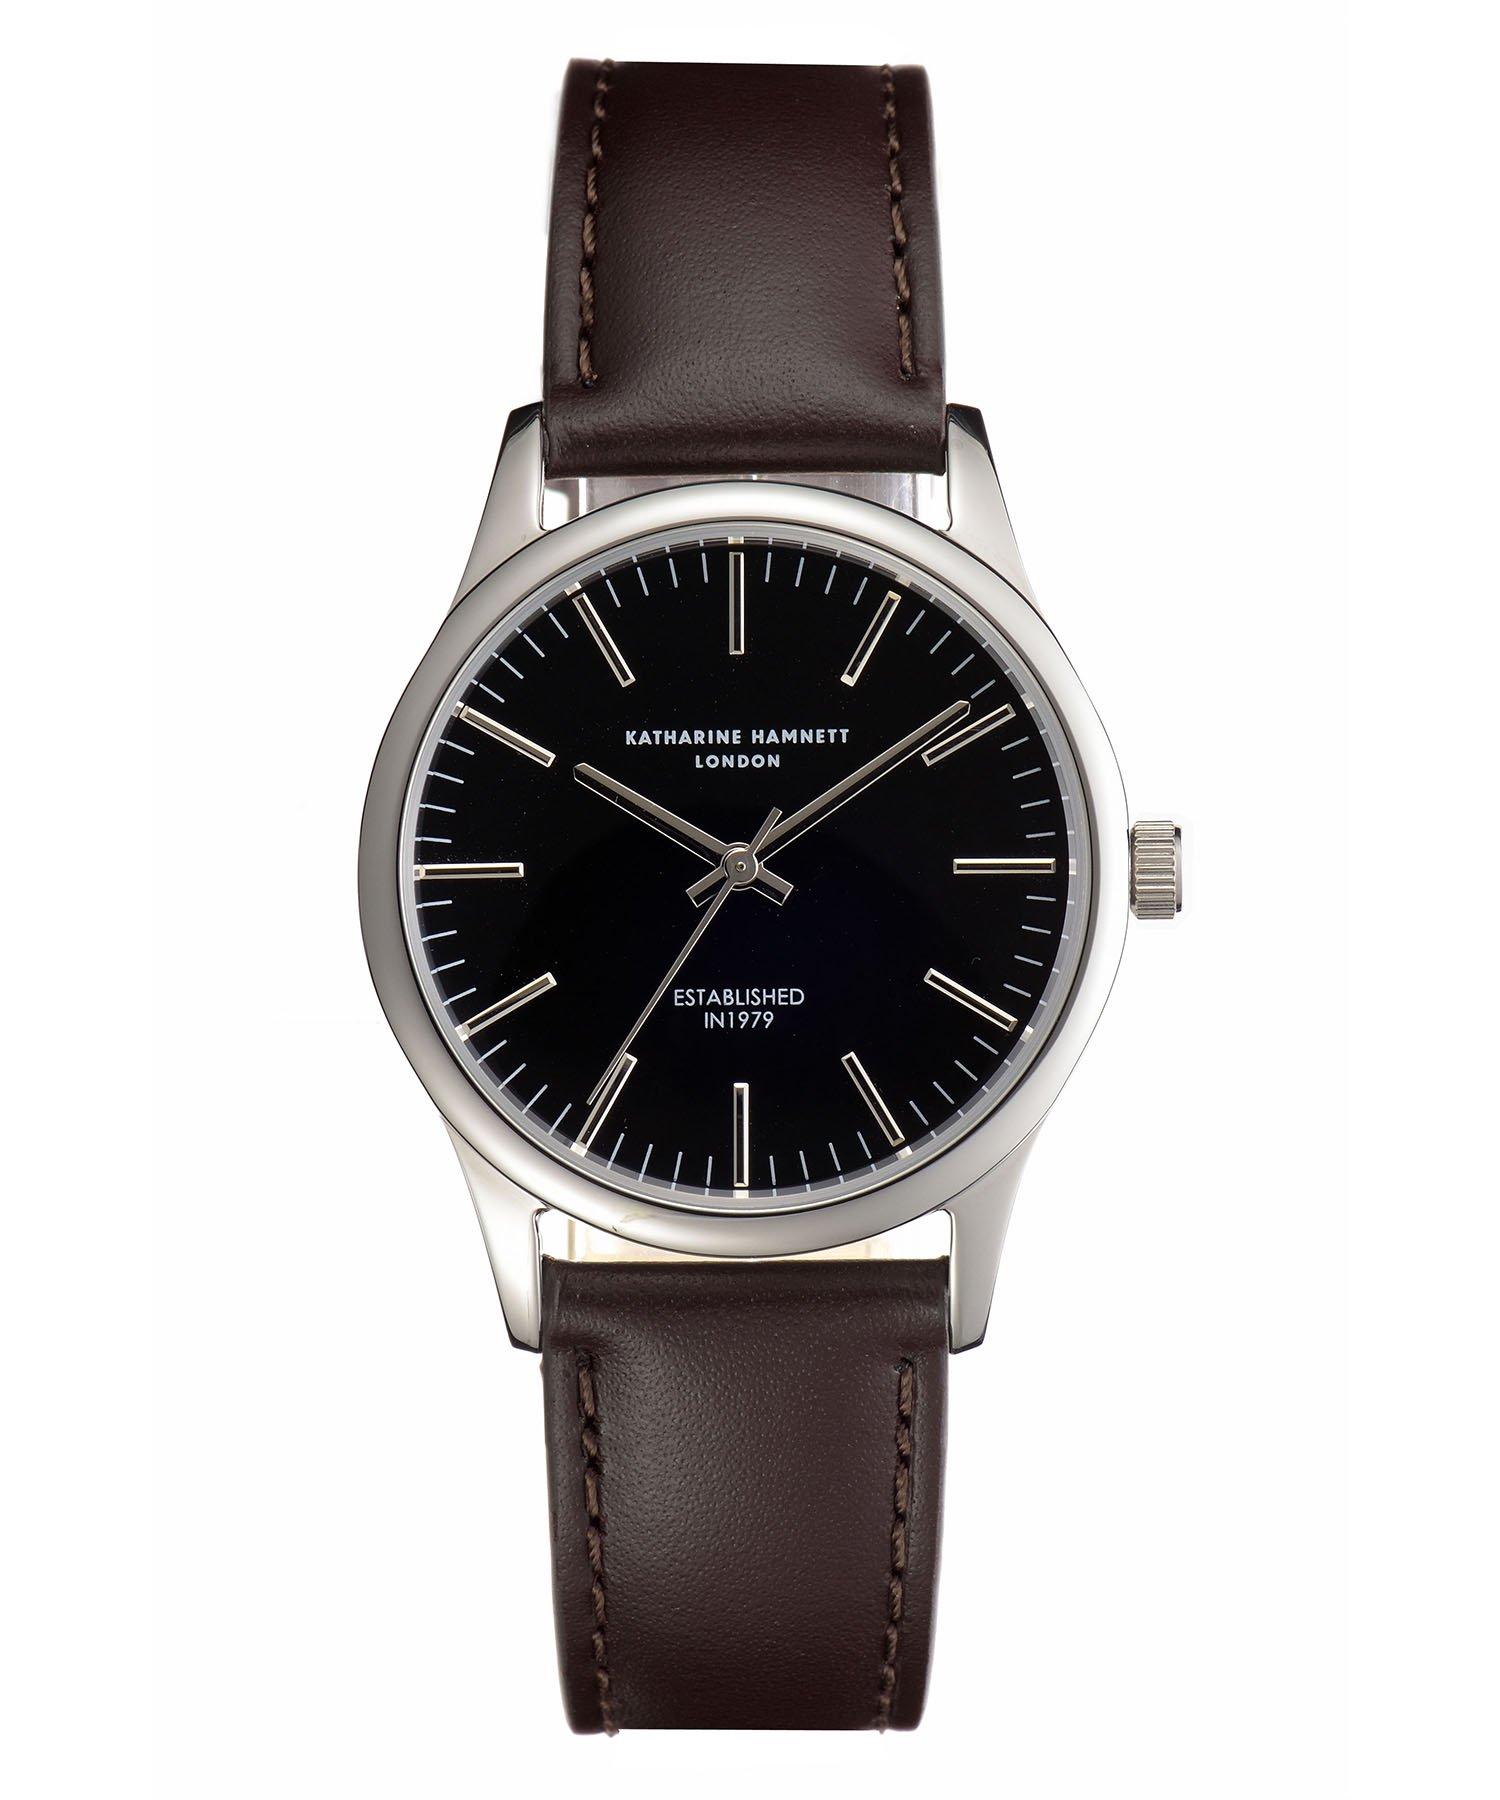 <img class='new_mark_img1' src='https://img.shop-pro.jp/img/new/icons15.gif' style='border:none;display:inline;margin:0px;padding:0px;width:auto;' />【KATHARINE HAMNETT LONDON】Black-dial Watch